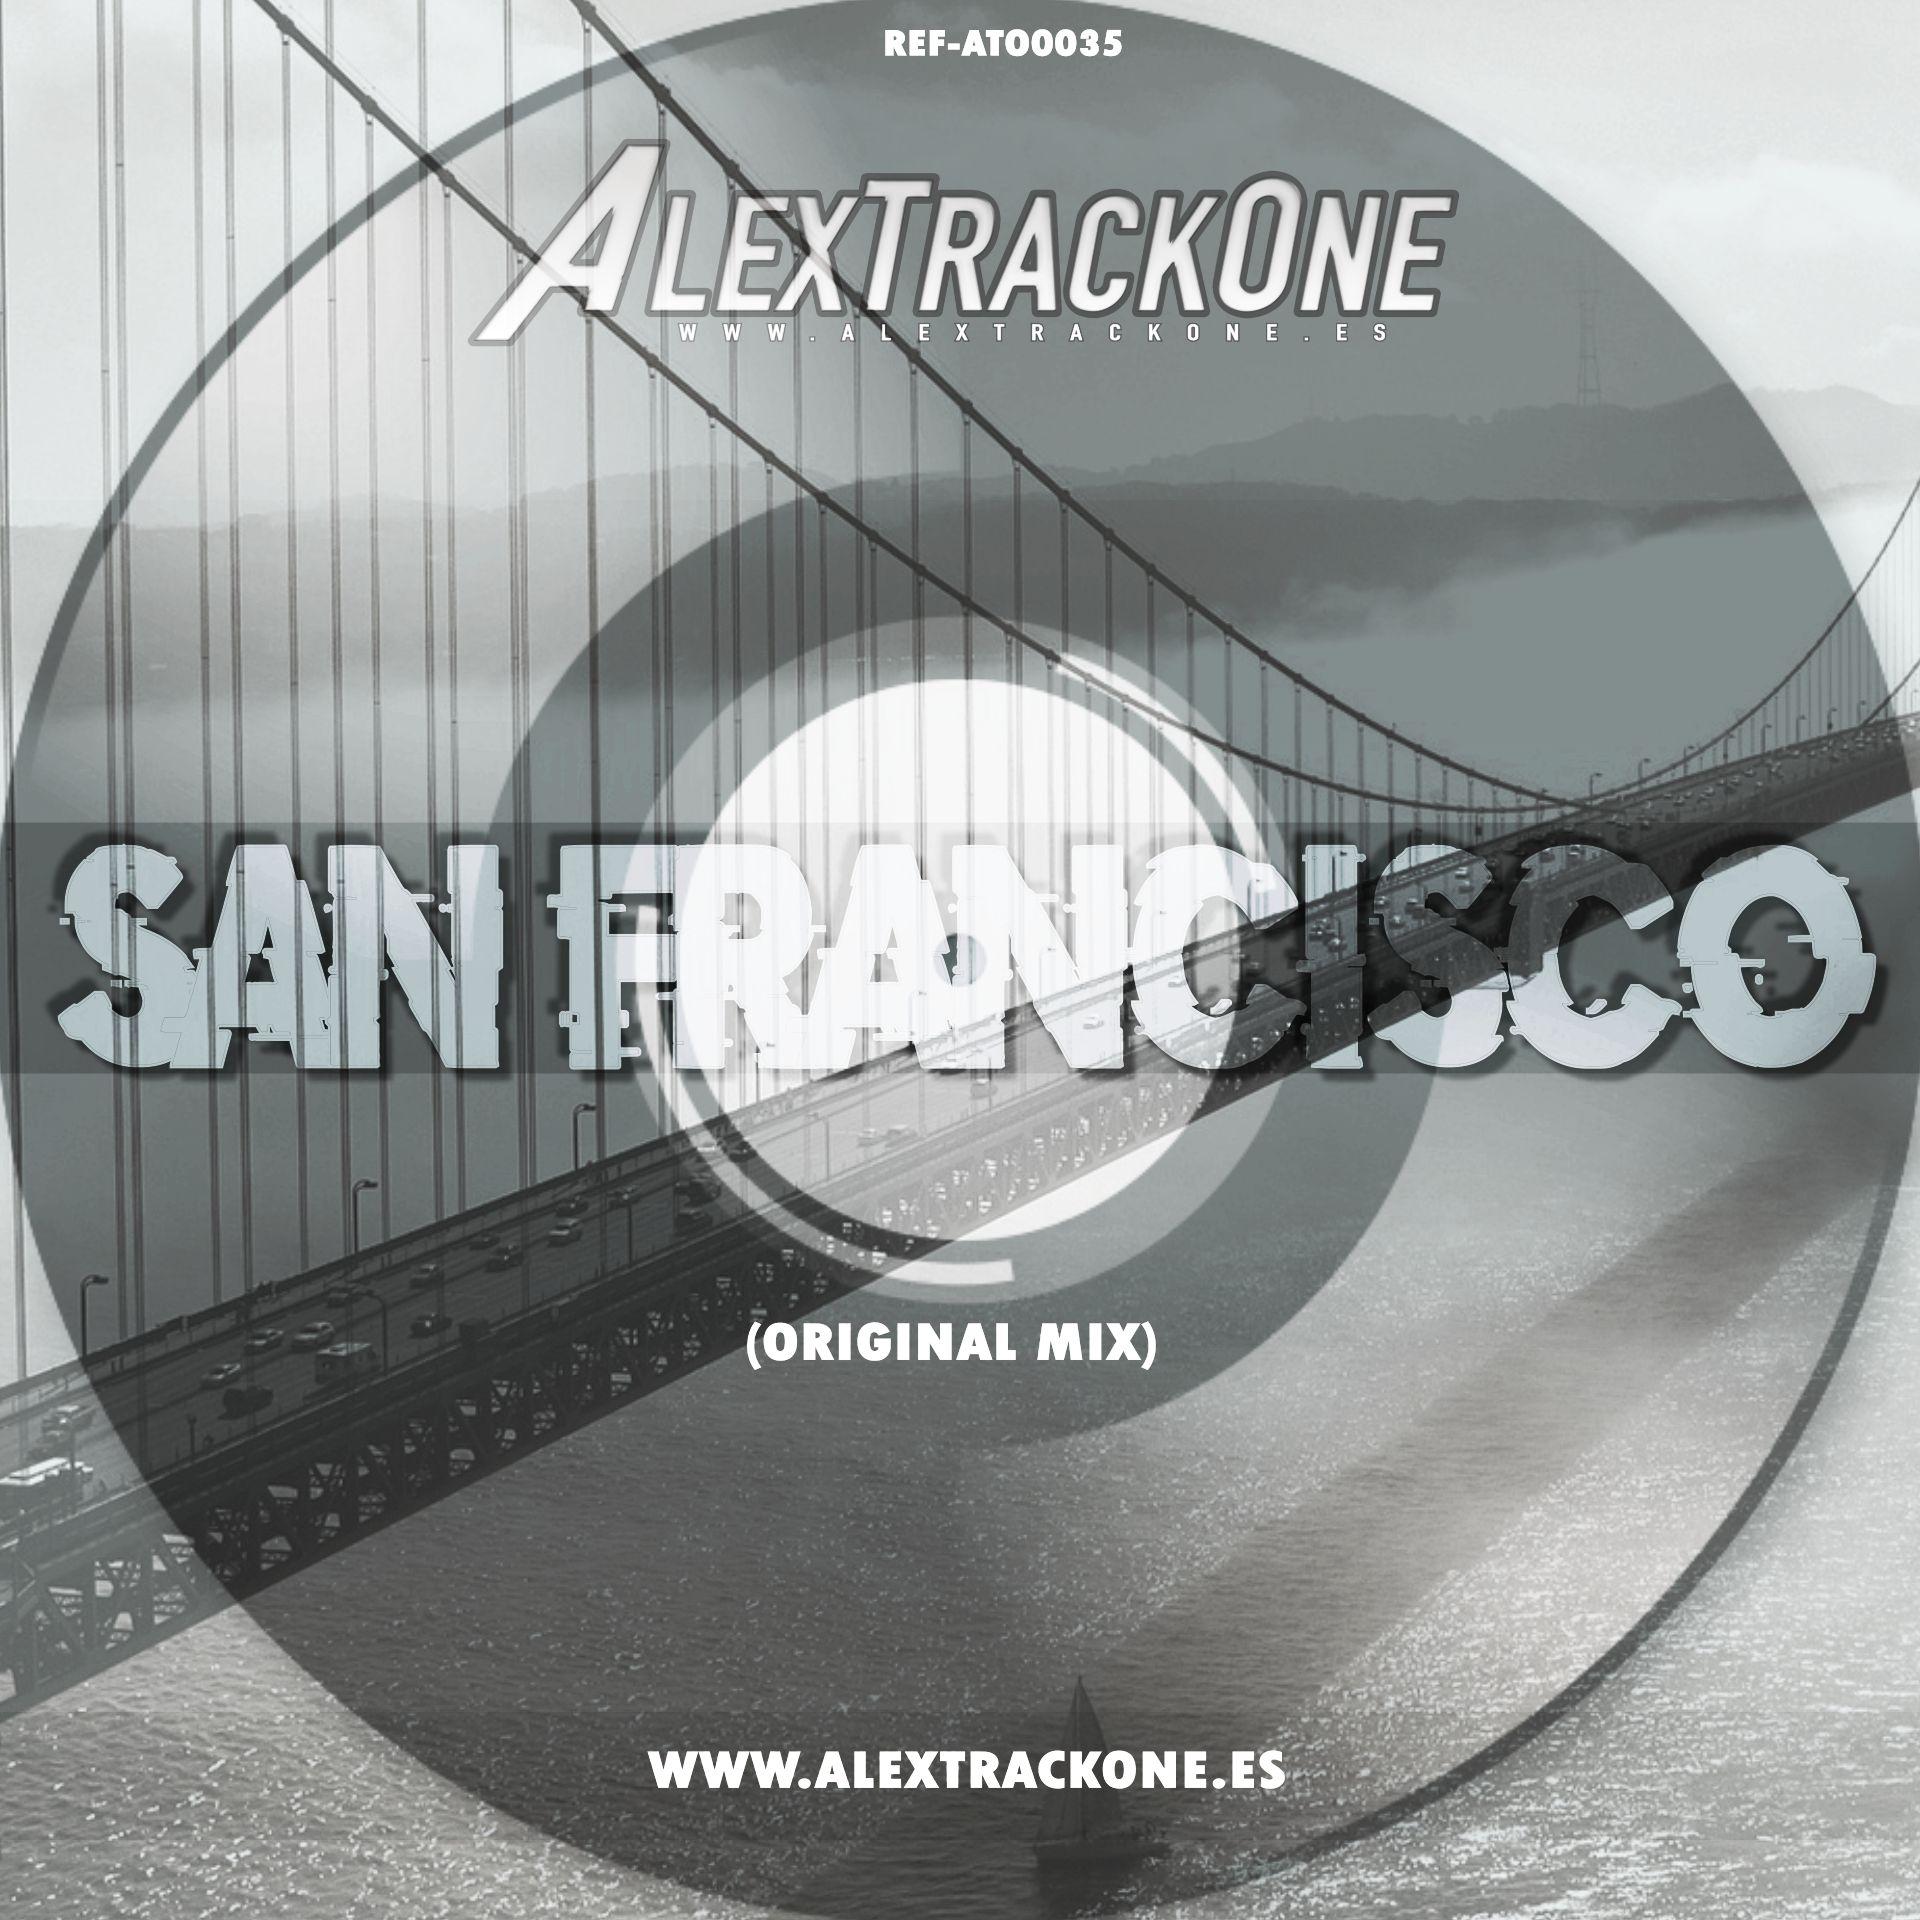 REF-ATO0035 SAN FRANCISCO (ORIGINAL MIX) (MP3 & WAV)